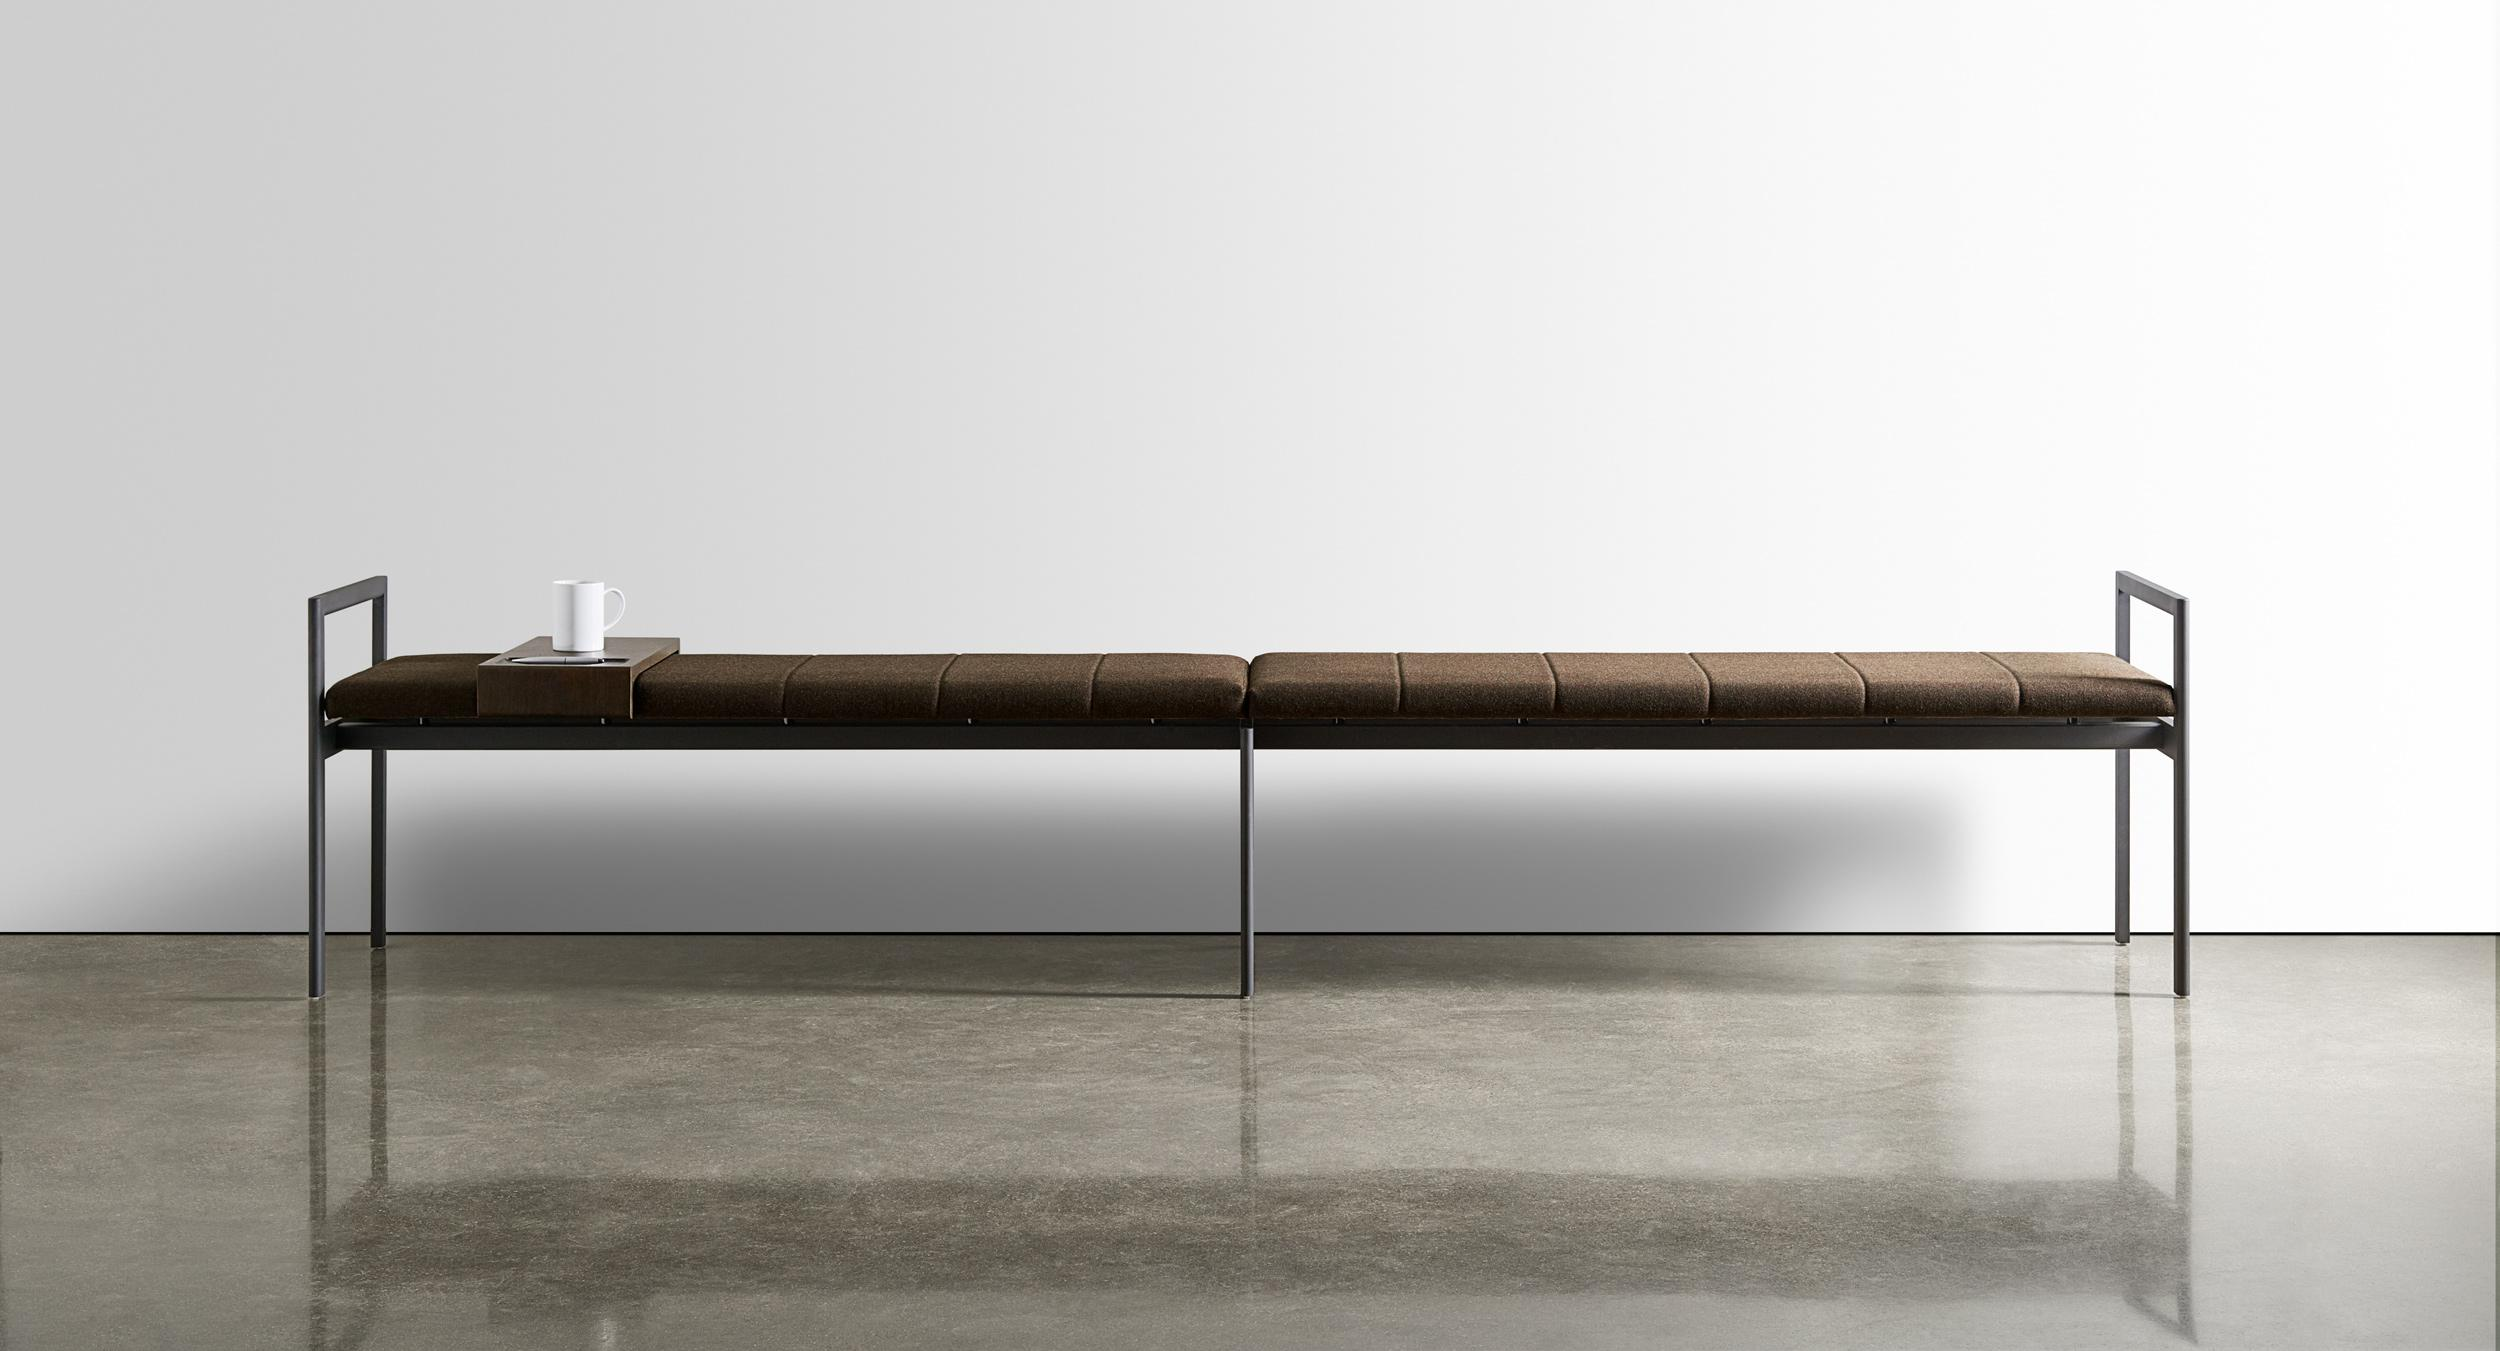 Sensational Halo Halcon Furniture Inzonedesignstudio Interior Chair Design Inzonedesignstudiocom